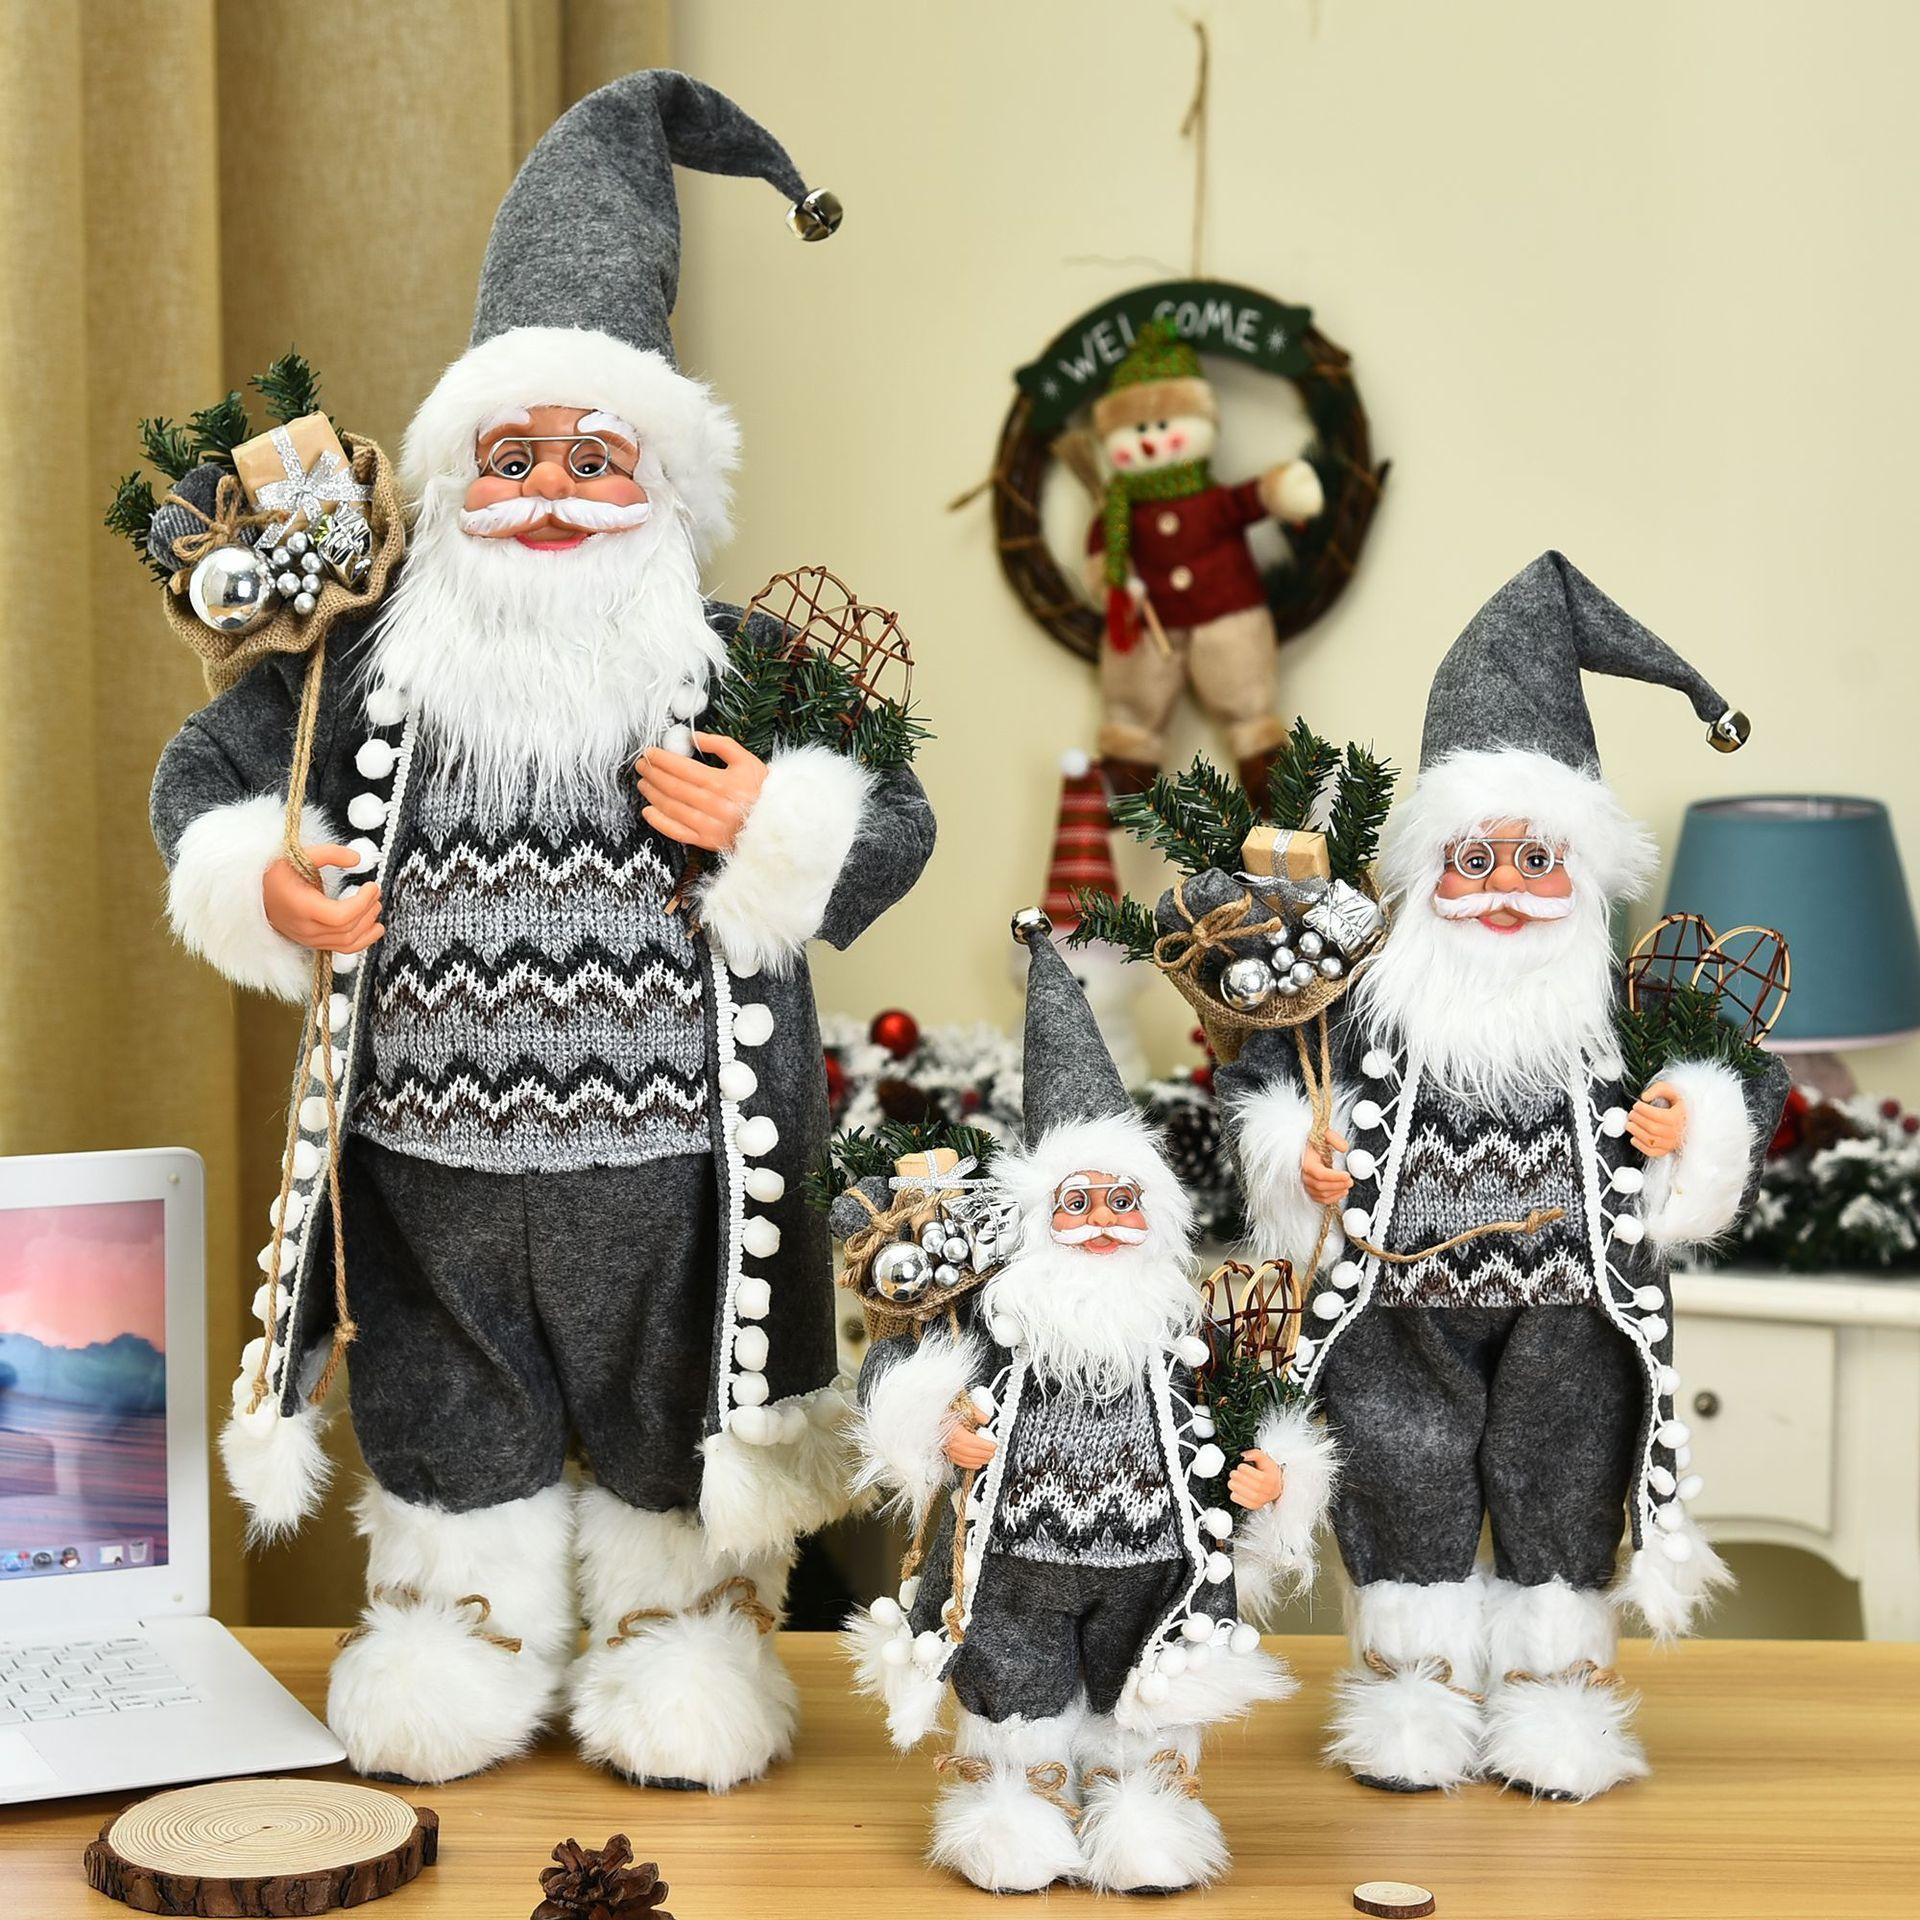 2021 New Christmas Decoration Santa Claus Doll Gift Christmas Tree Decor Creative Plush Santa Claus Toy Ornaments 30/45/60 Cm 1008